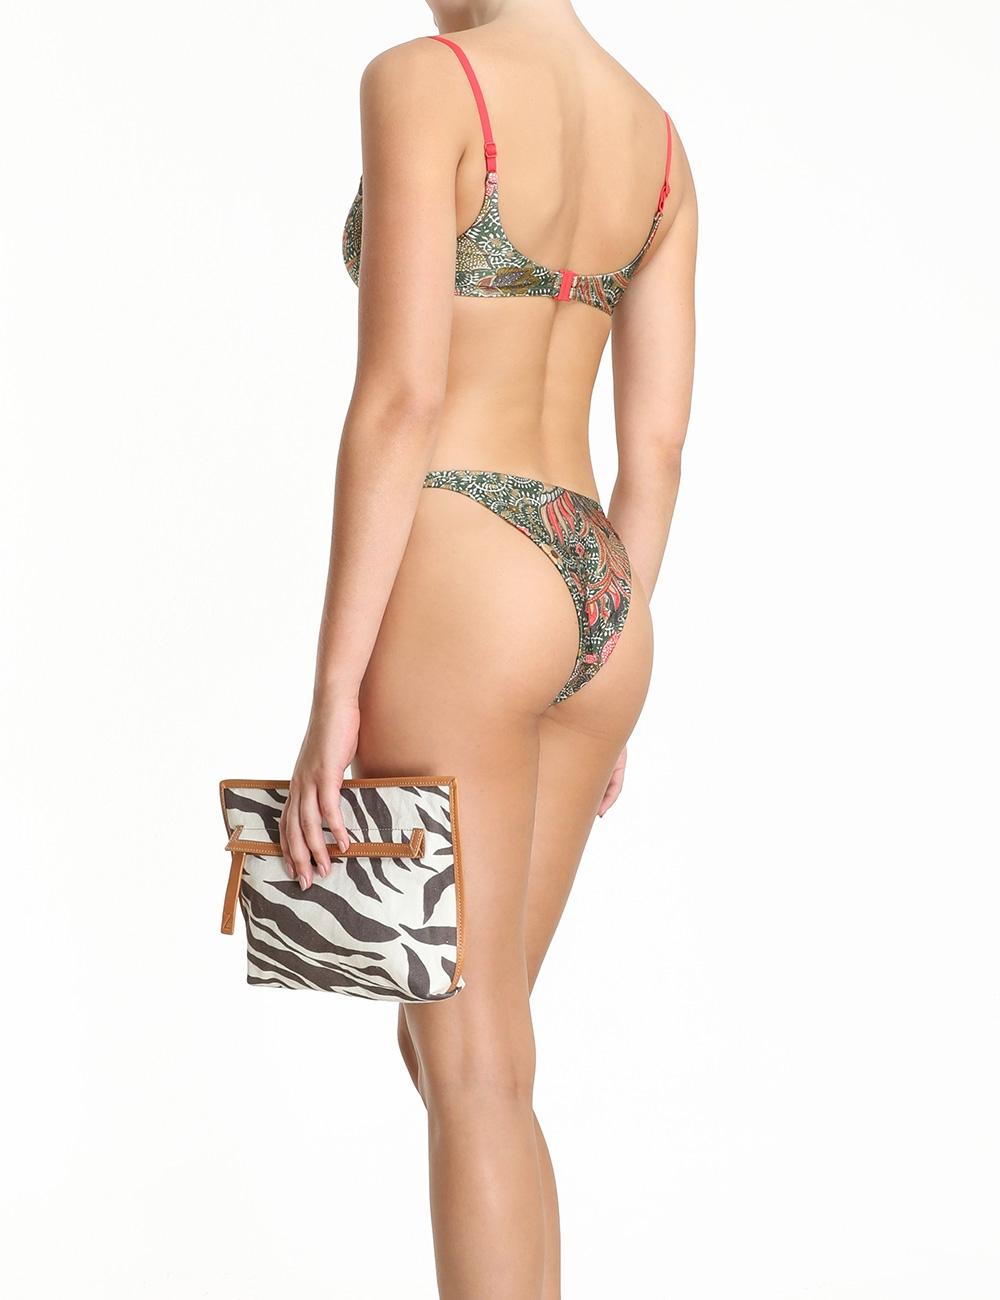 Empire Draw Bikini